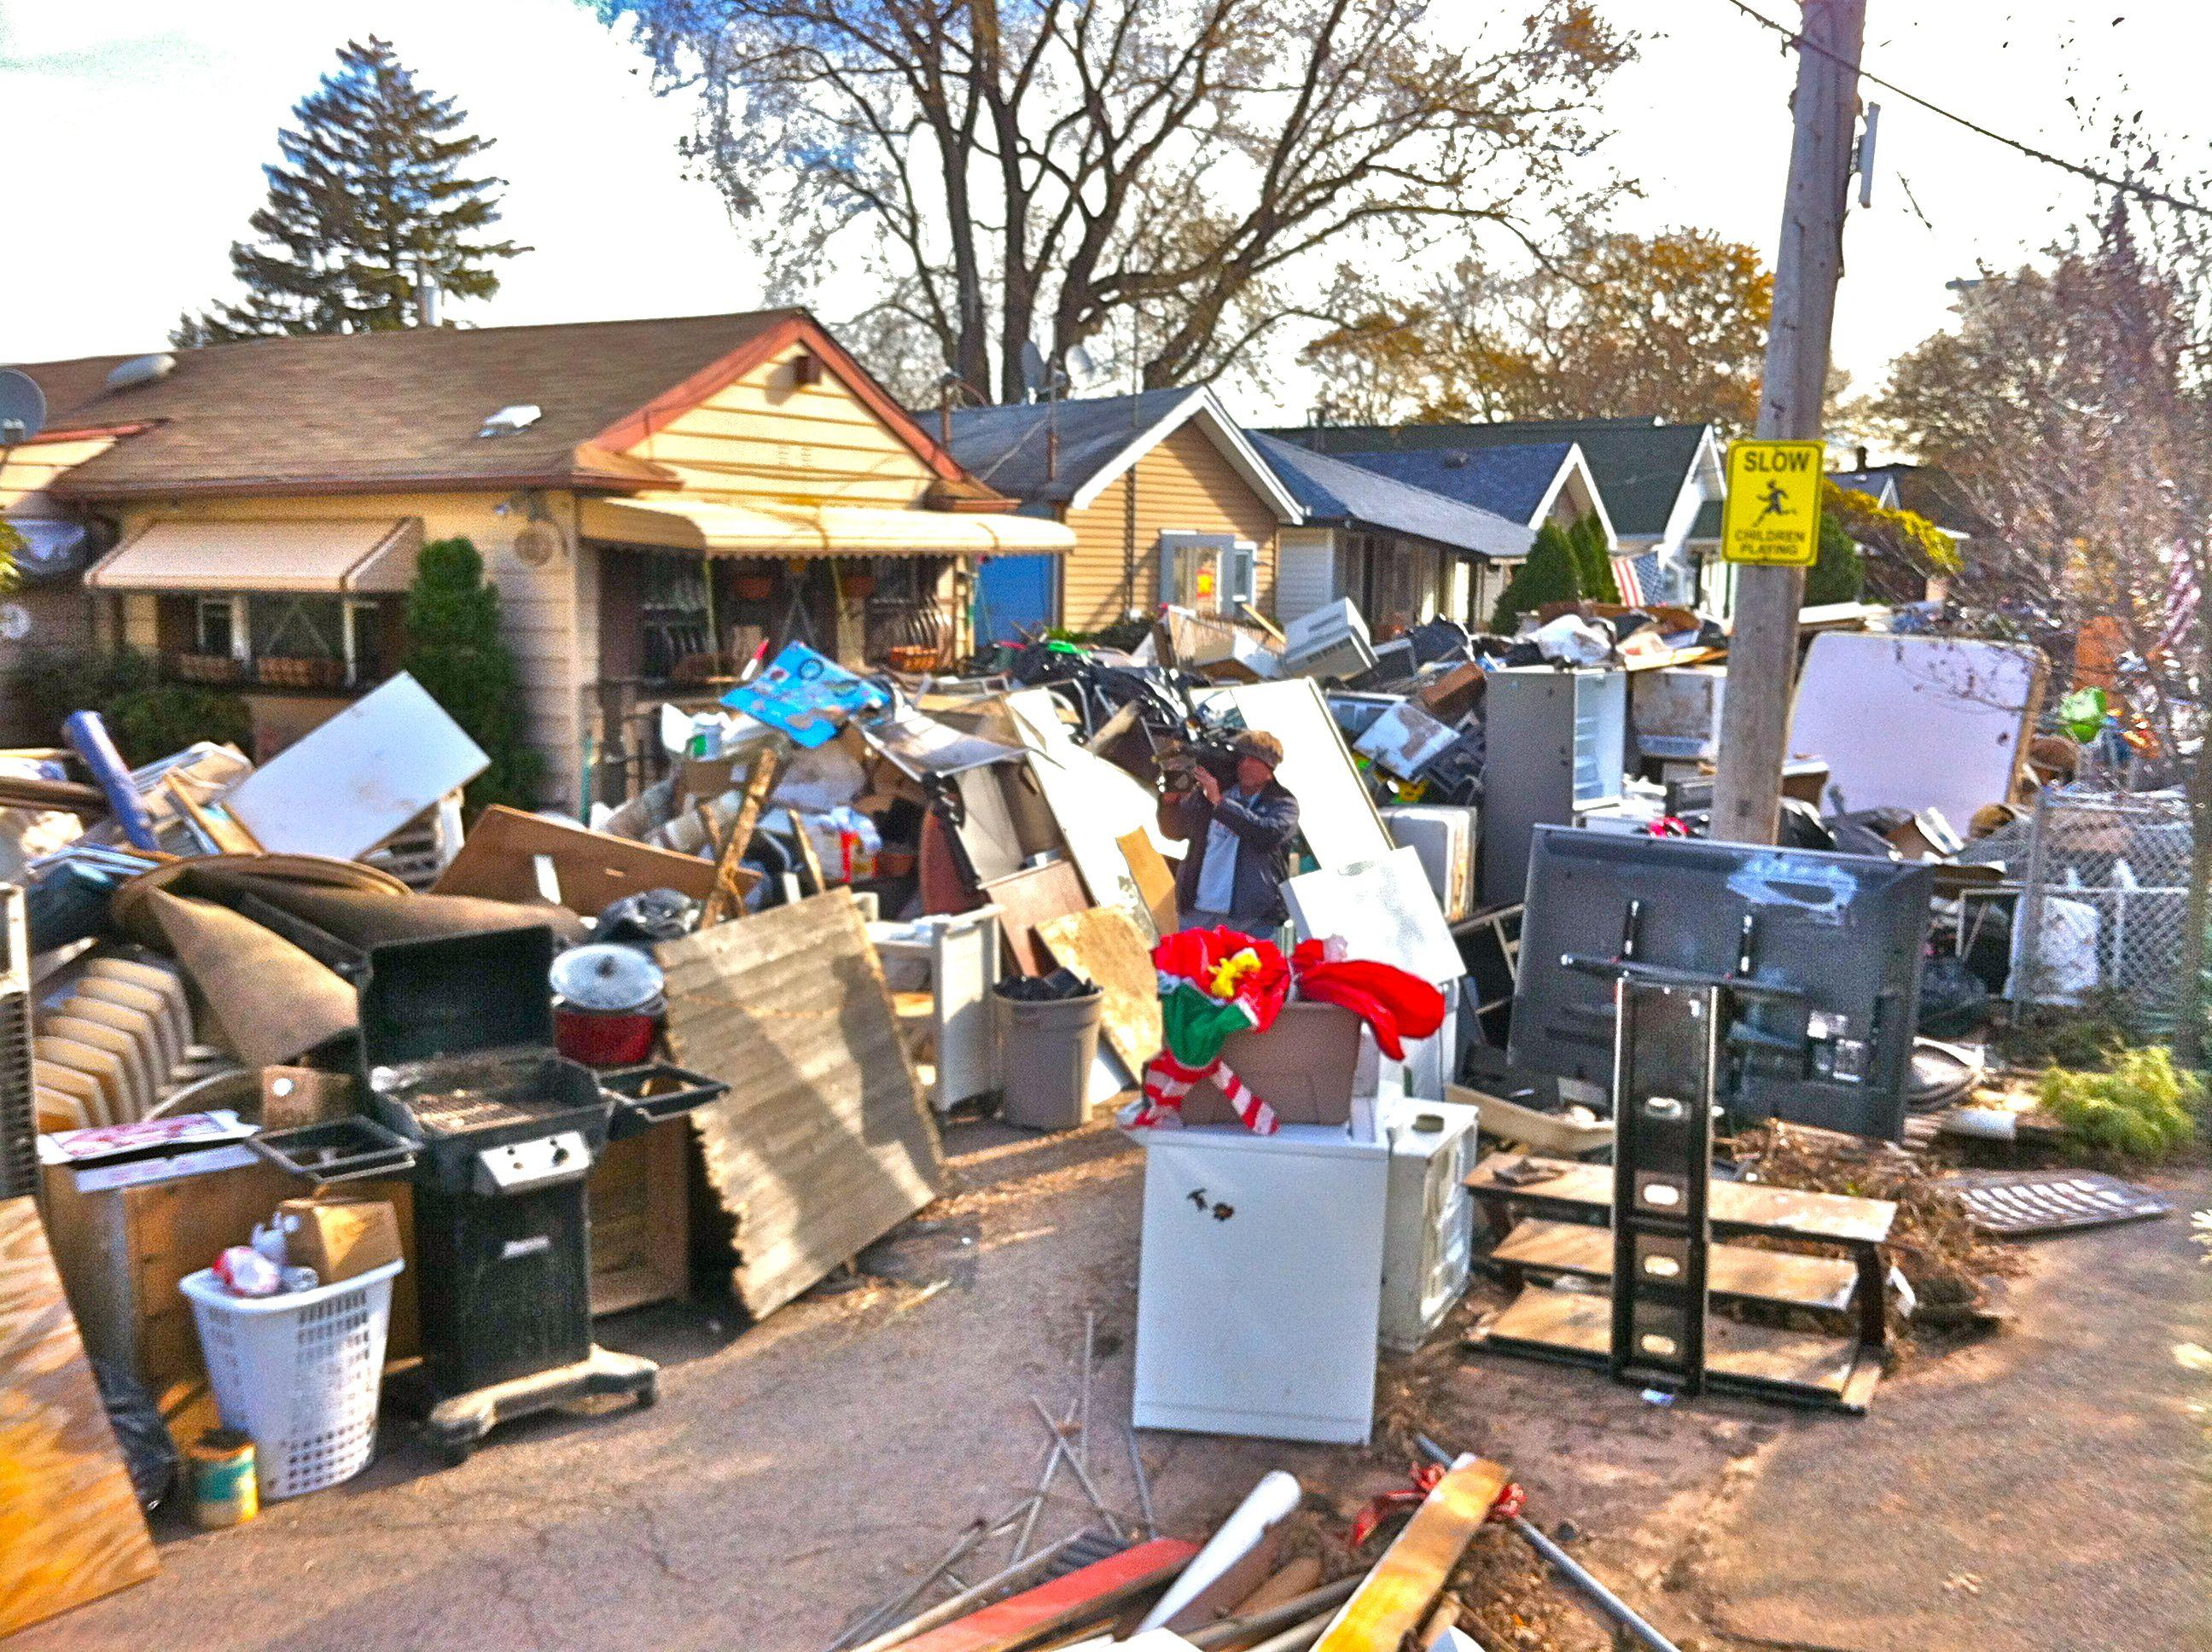 New Dorp Staten Island Hurricane Sandy Devastation Sven Vik Hurricane Sandy Devastation Staten Island